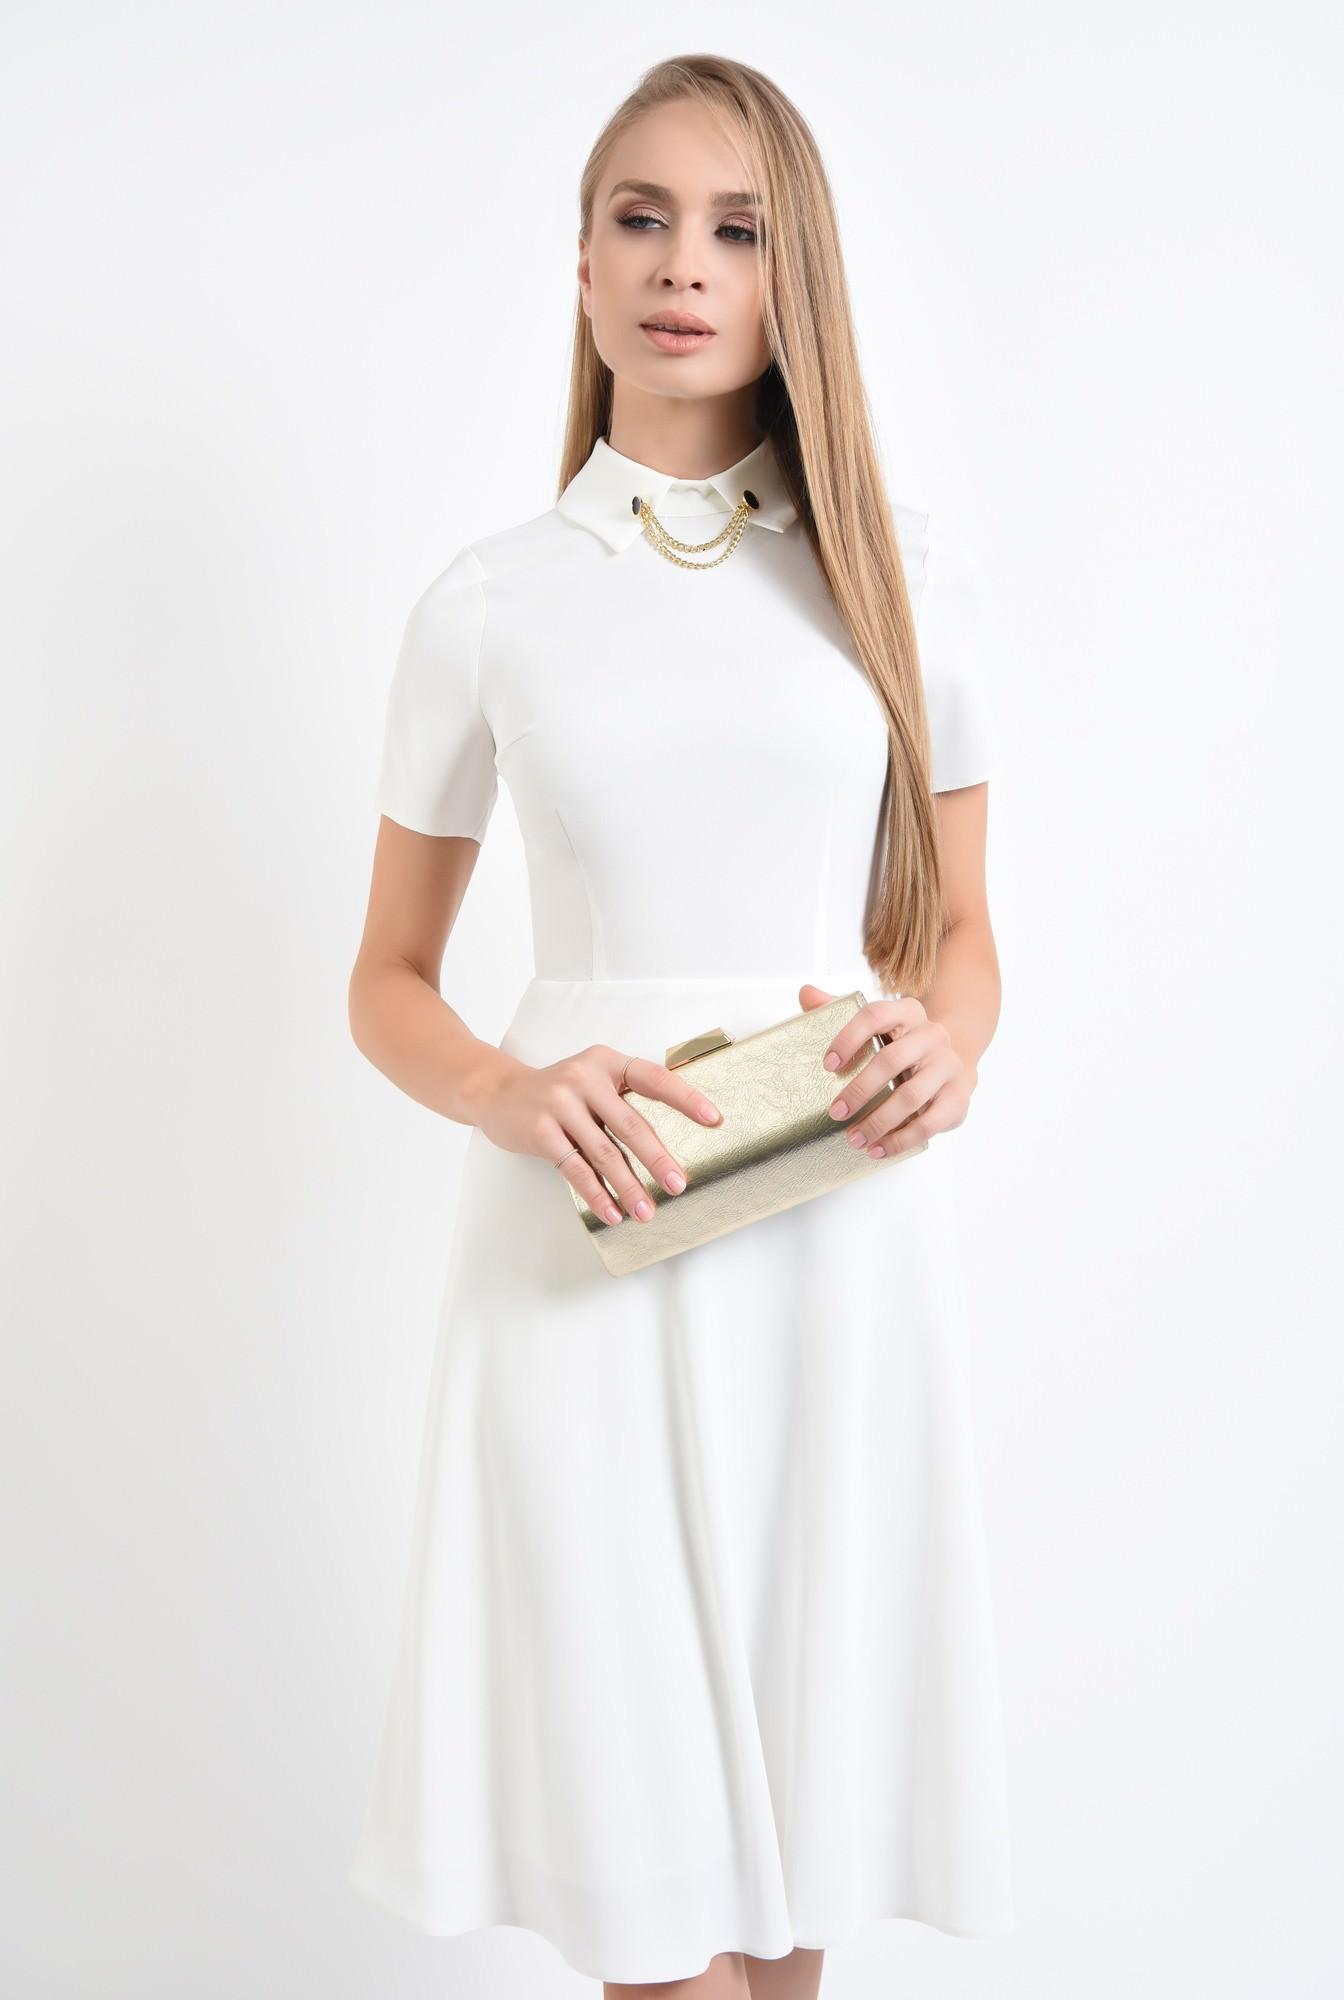 0 - 360 - rochie alba eleganta, bie, lungime medie